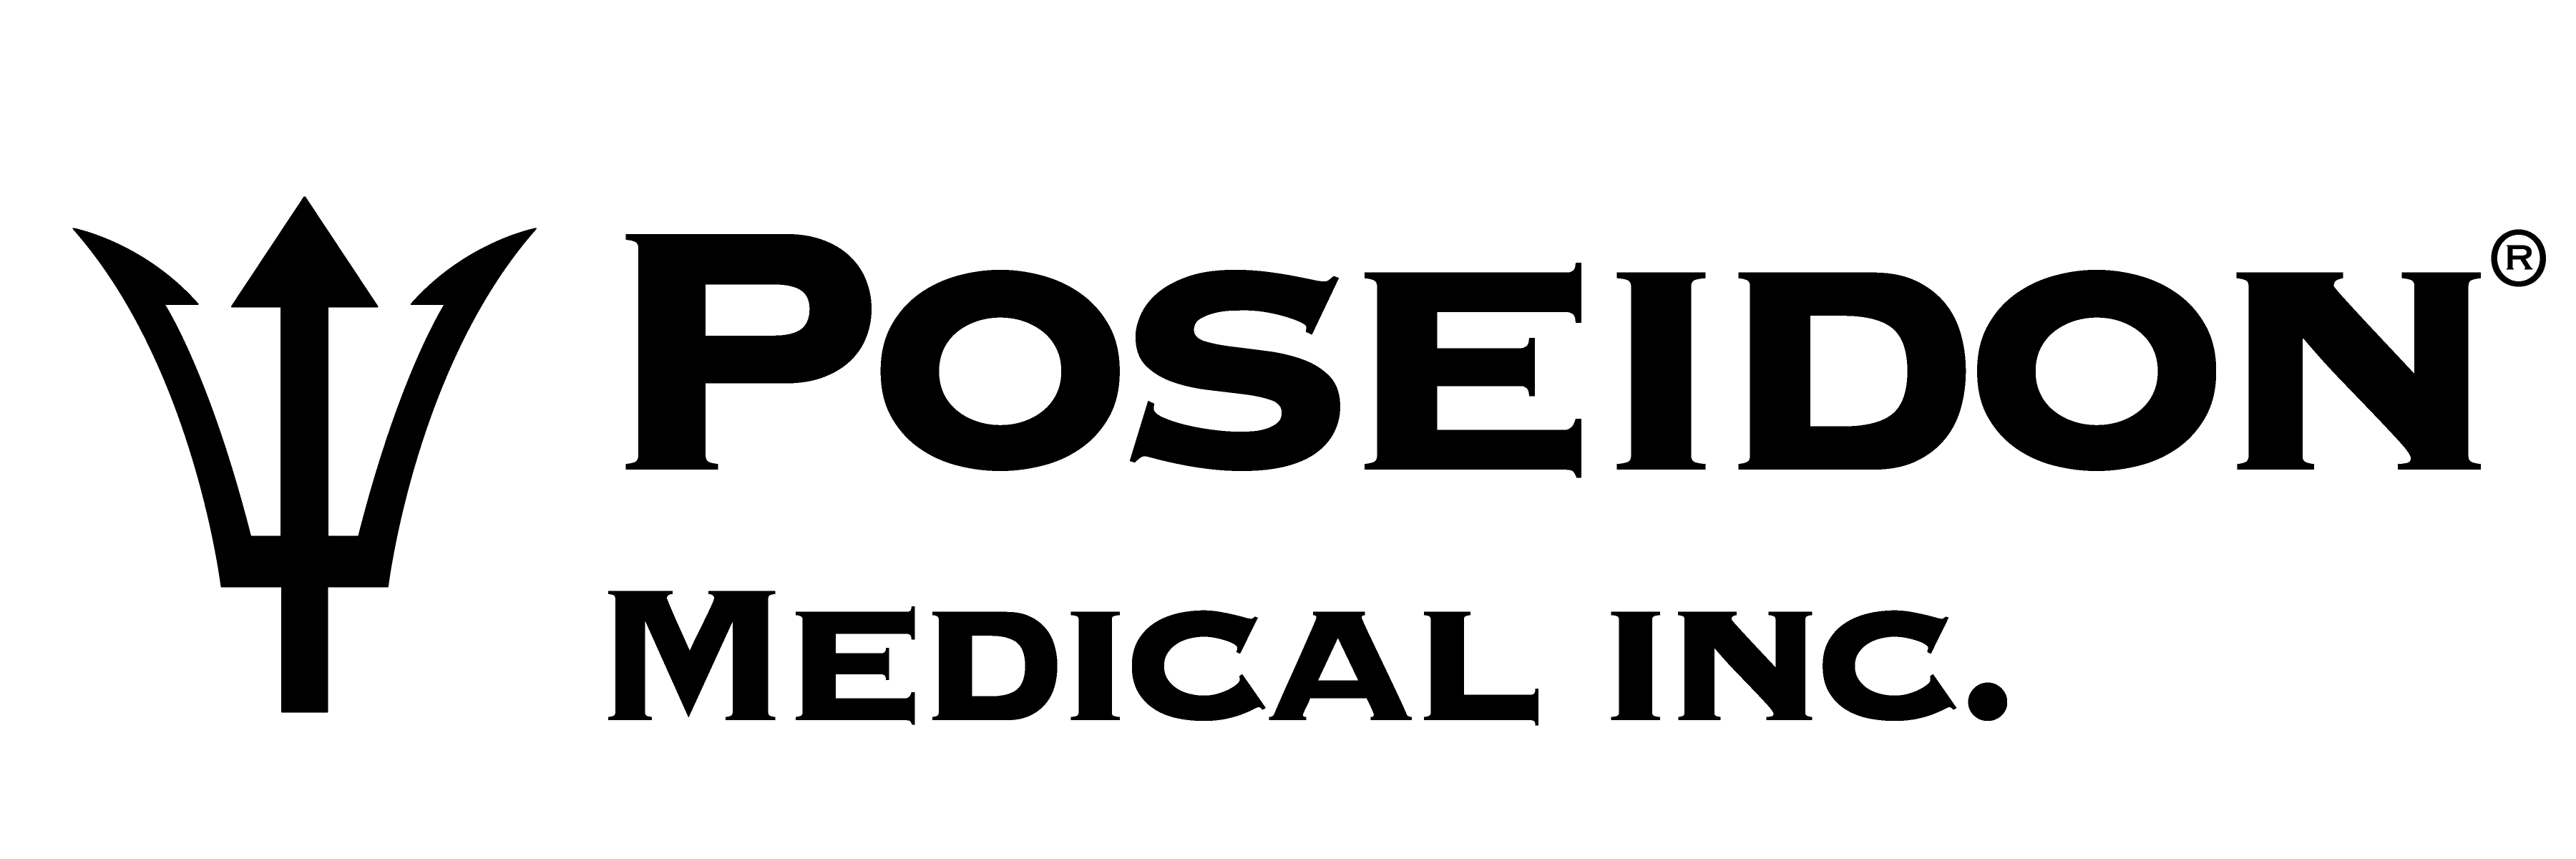 Poseidon Medical Inc.